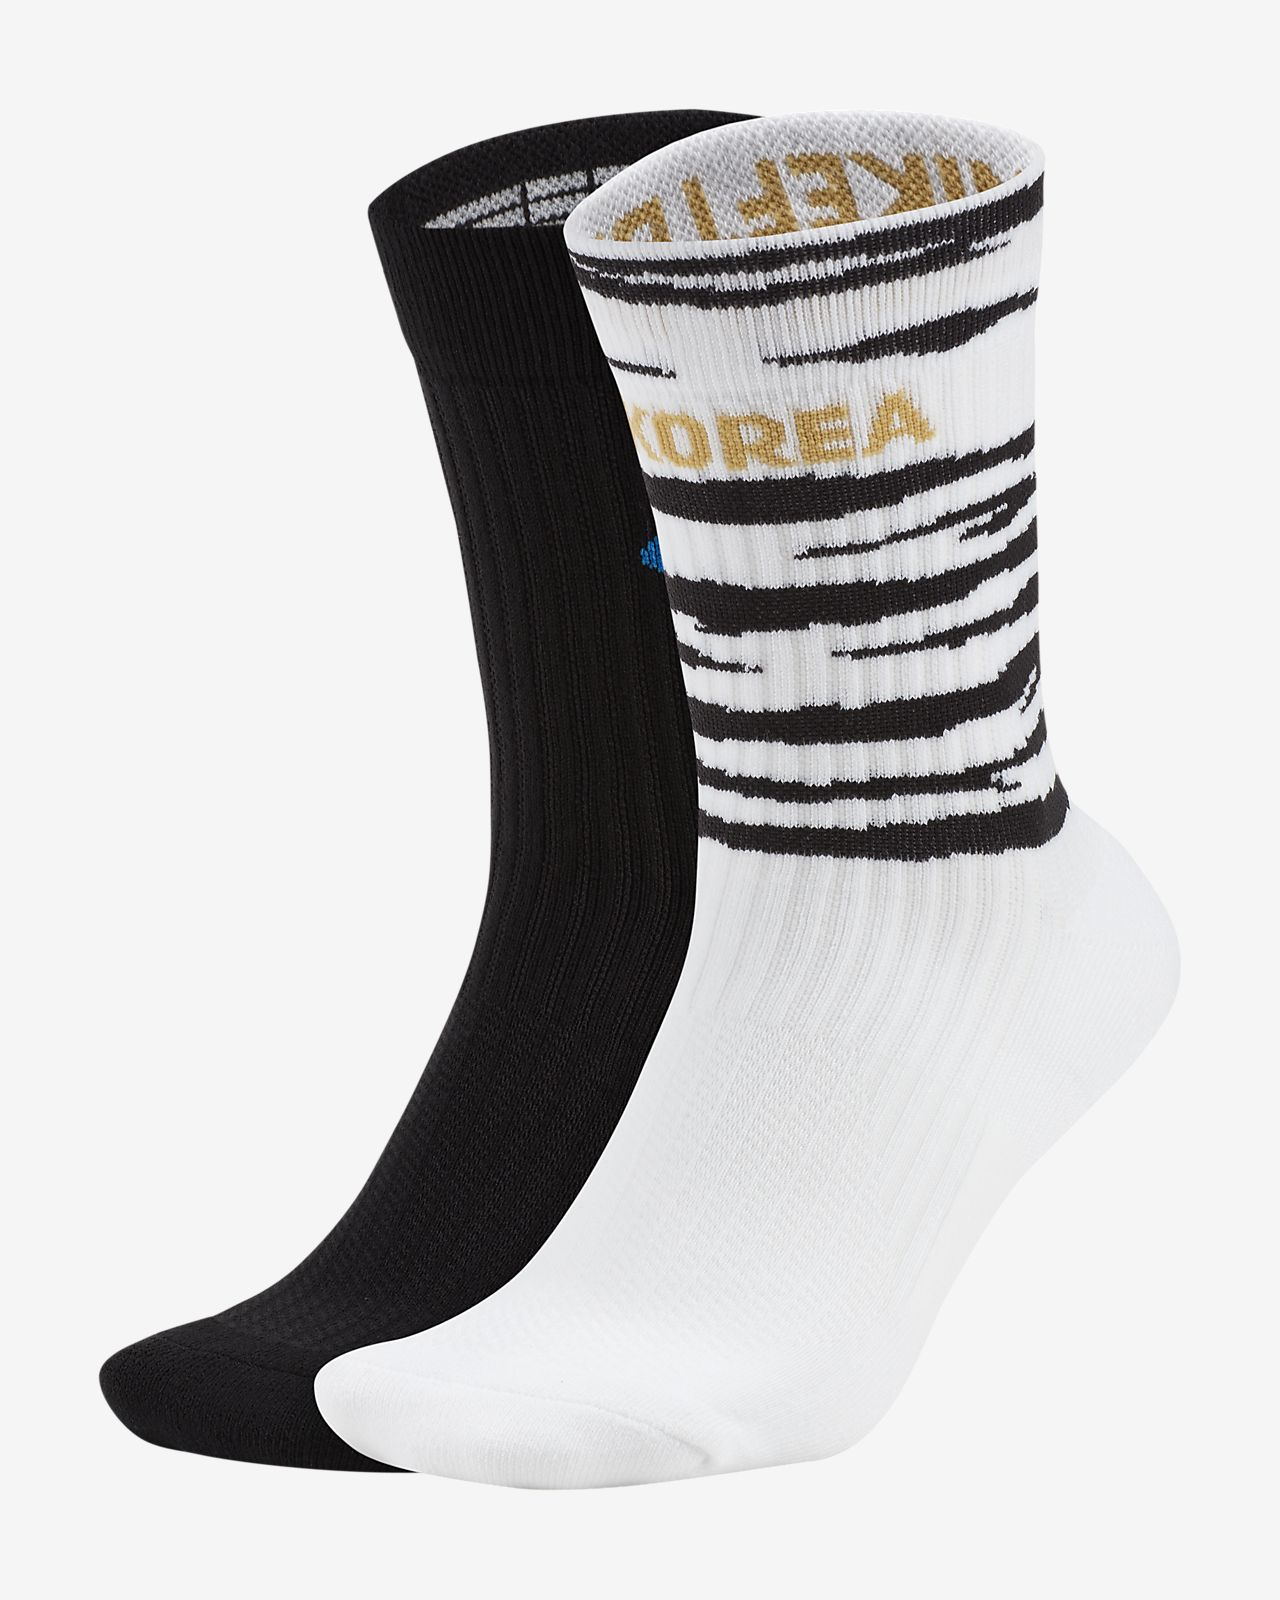 Calcetines largos de fútbol SNKR Sox Shox de Corea (dos pares)